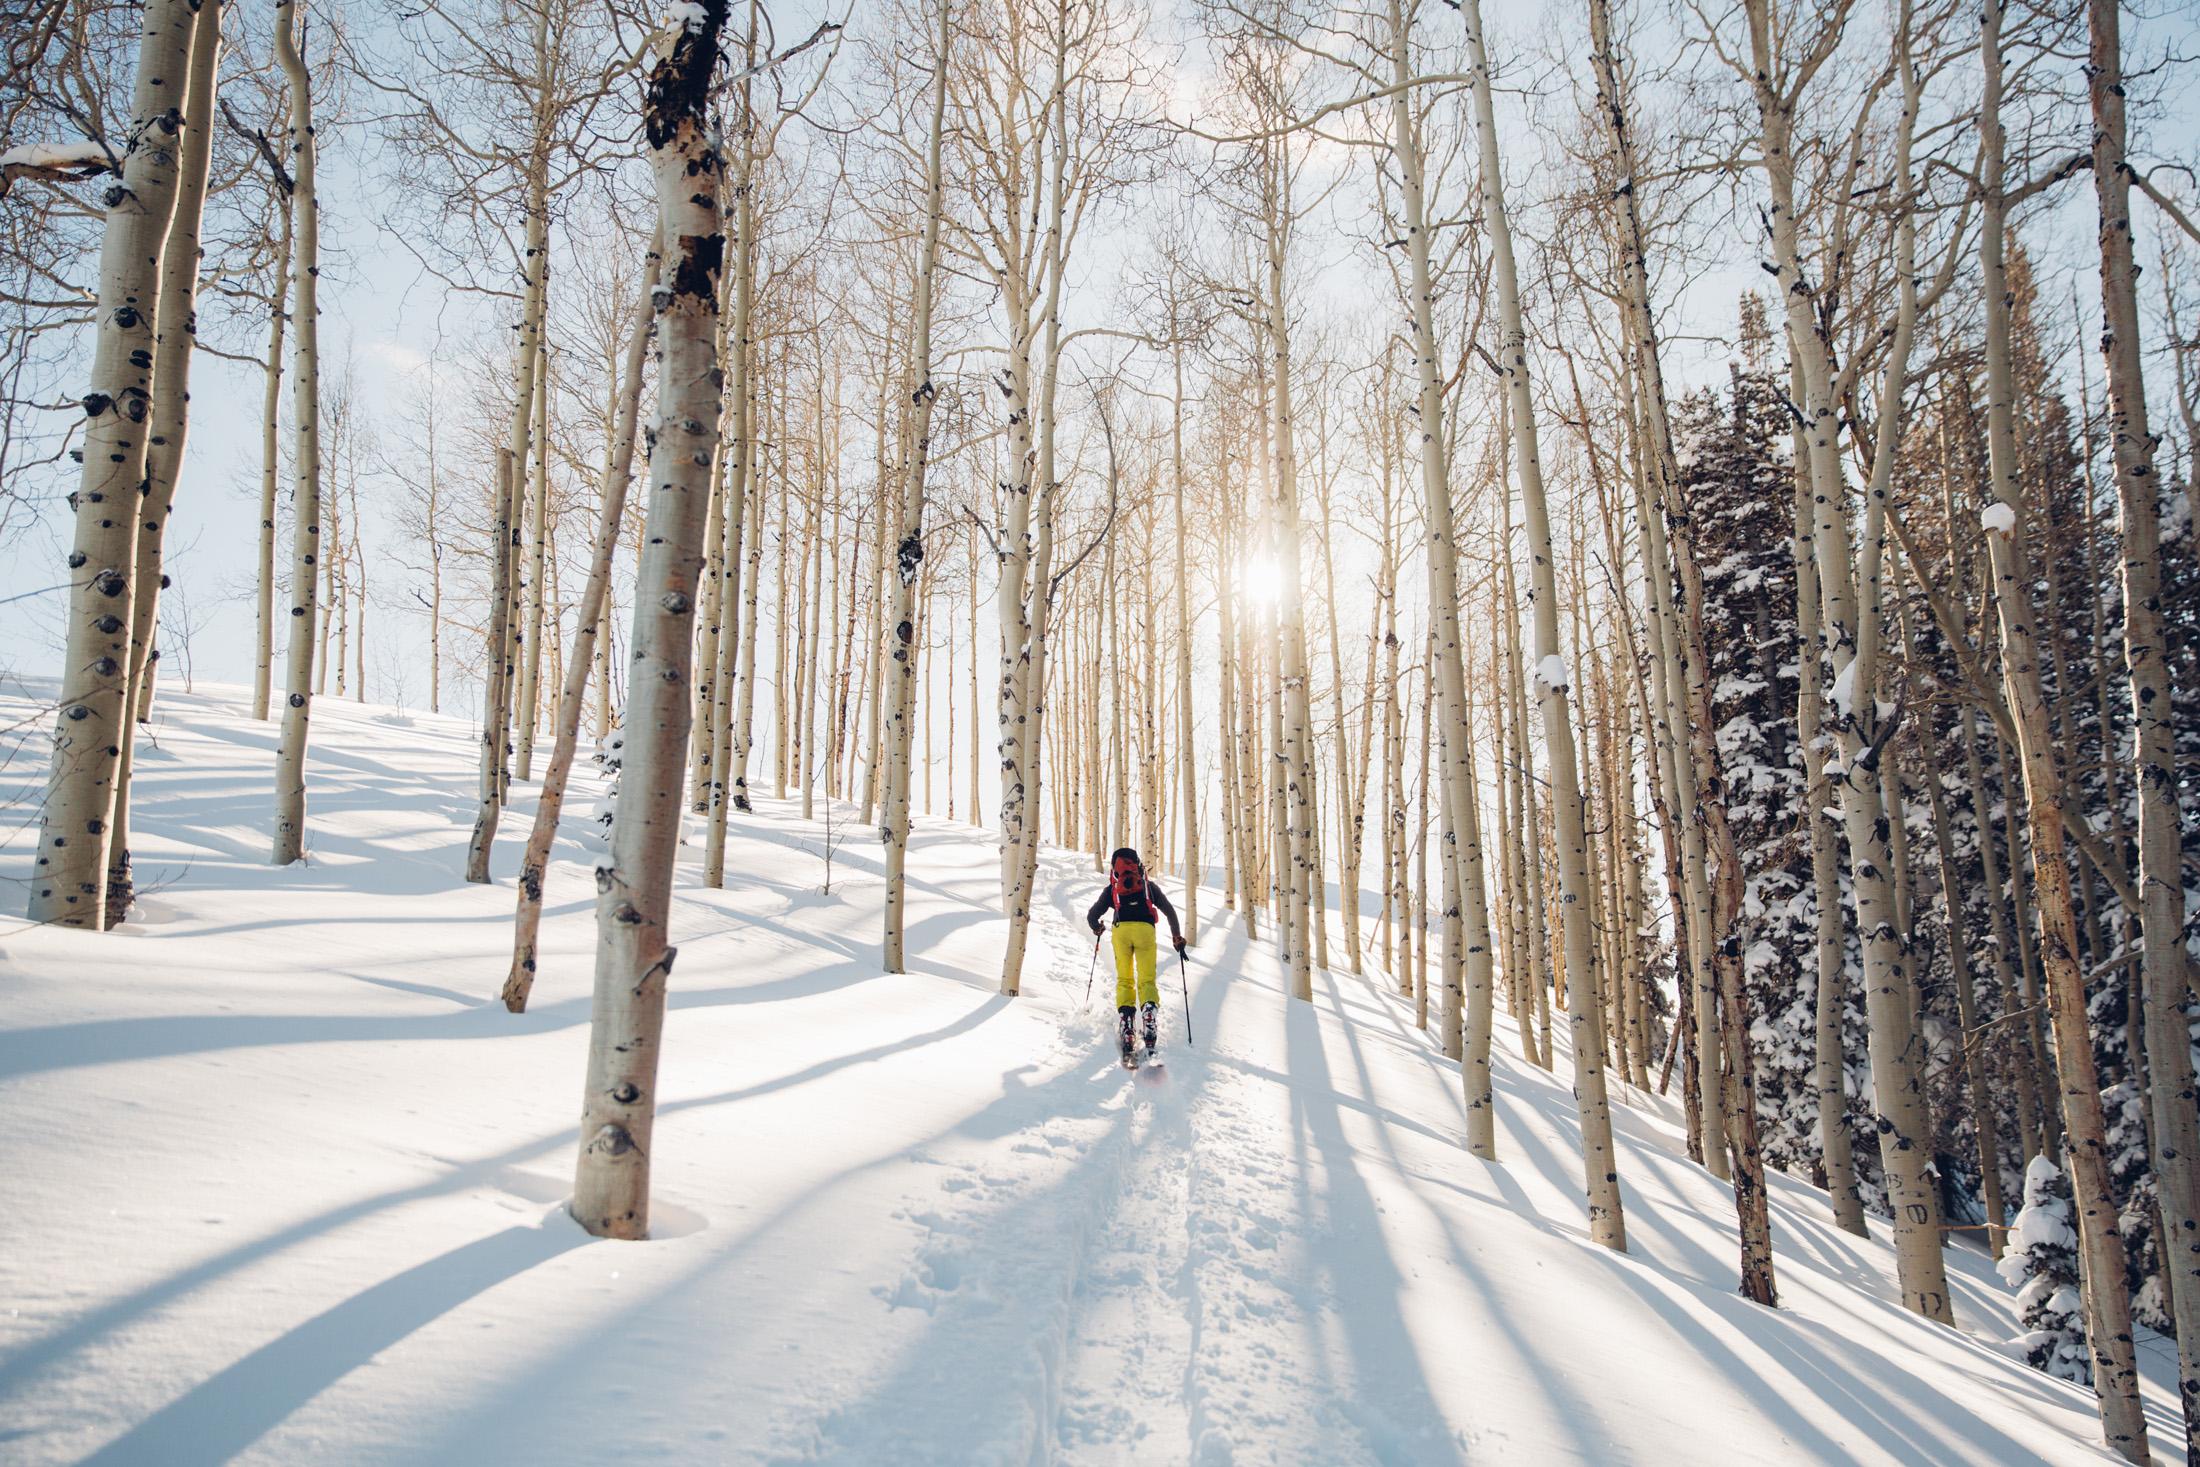 josh-donlan-backcountry-skiing-midway-utah-aspens-wide.jpg